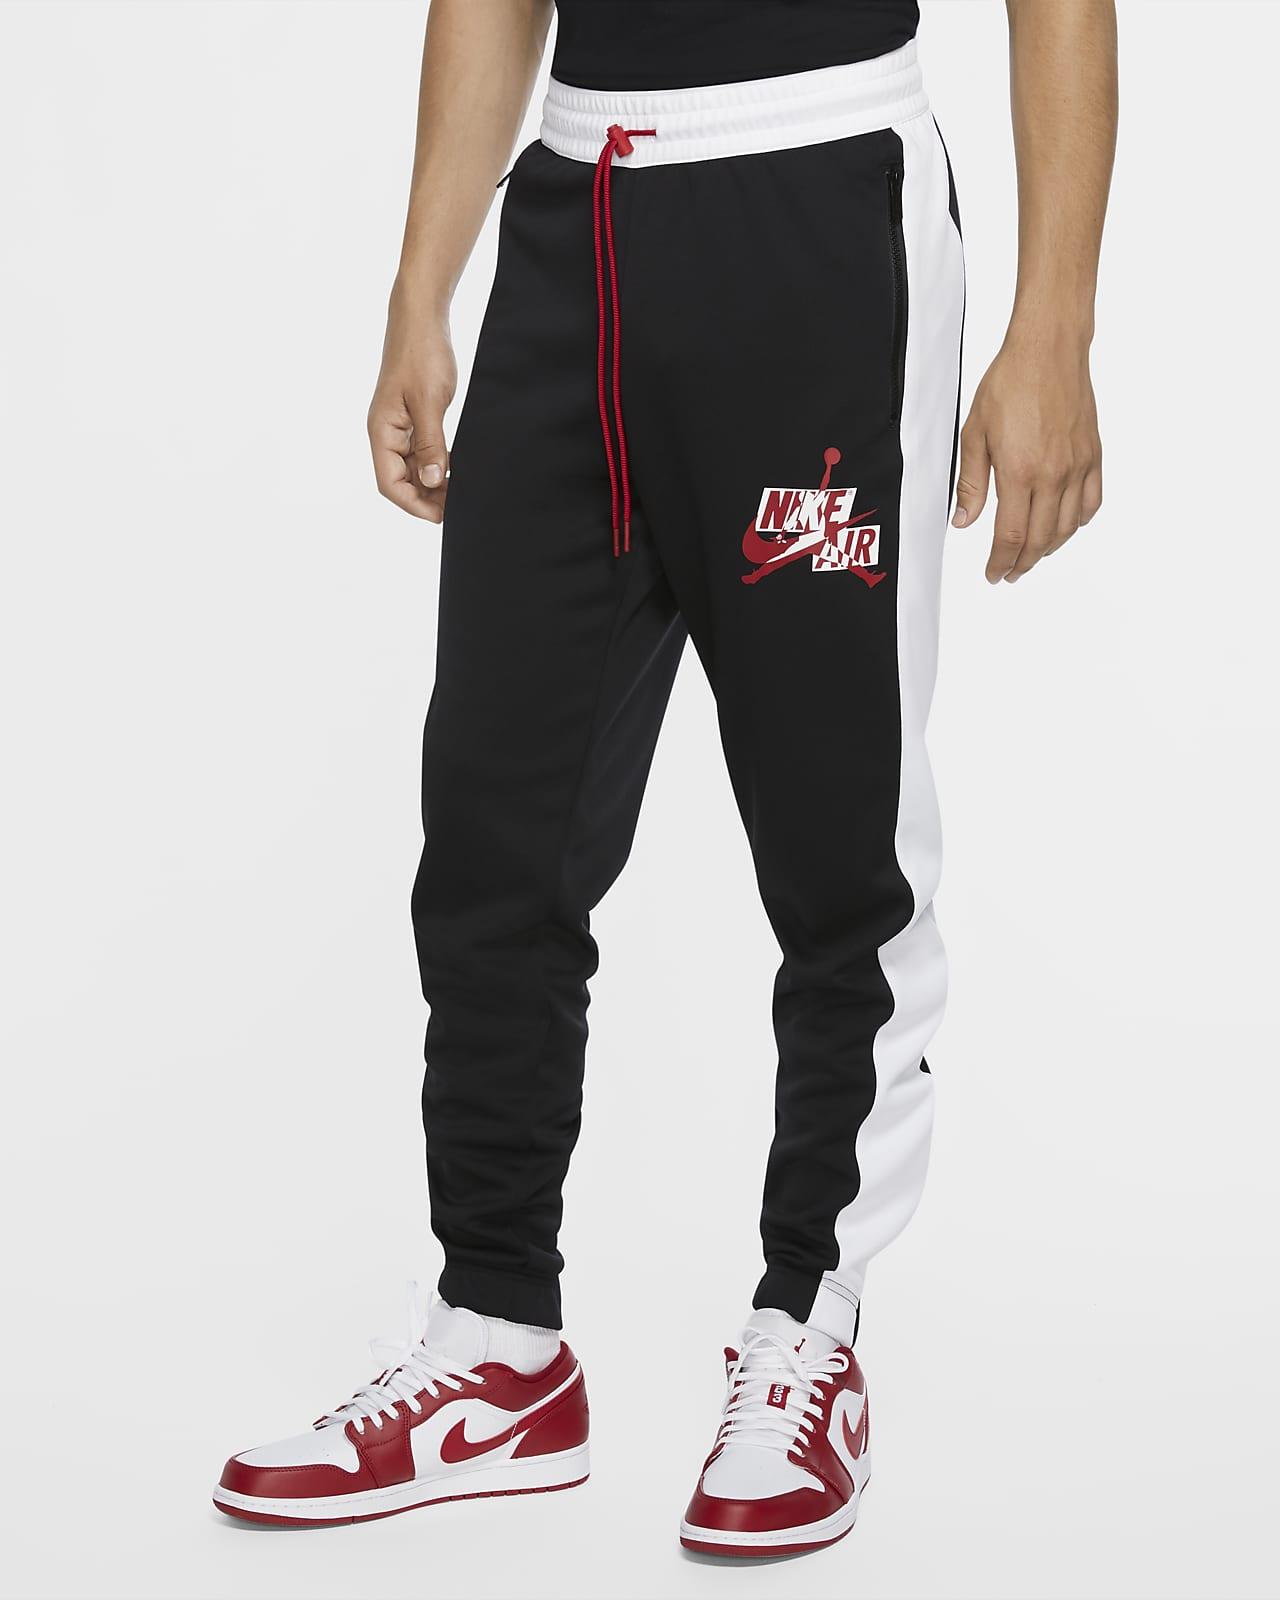 تغضب موضه وعد Pantalon Nike Jordan Dsvdedommel Com